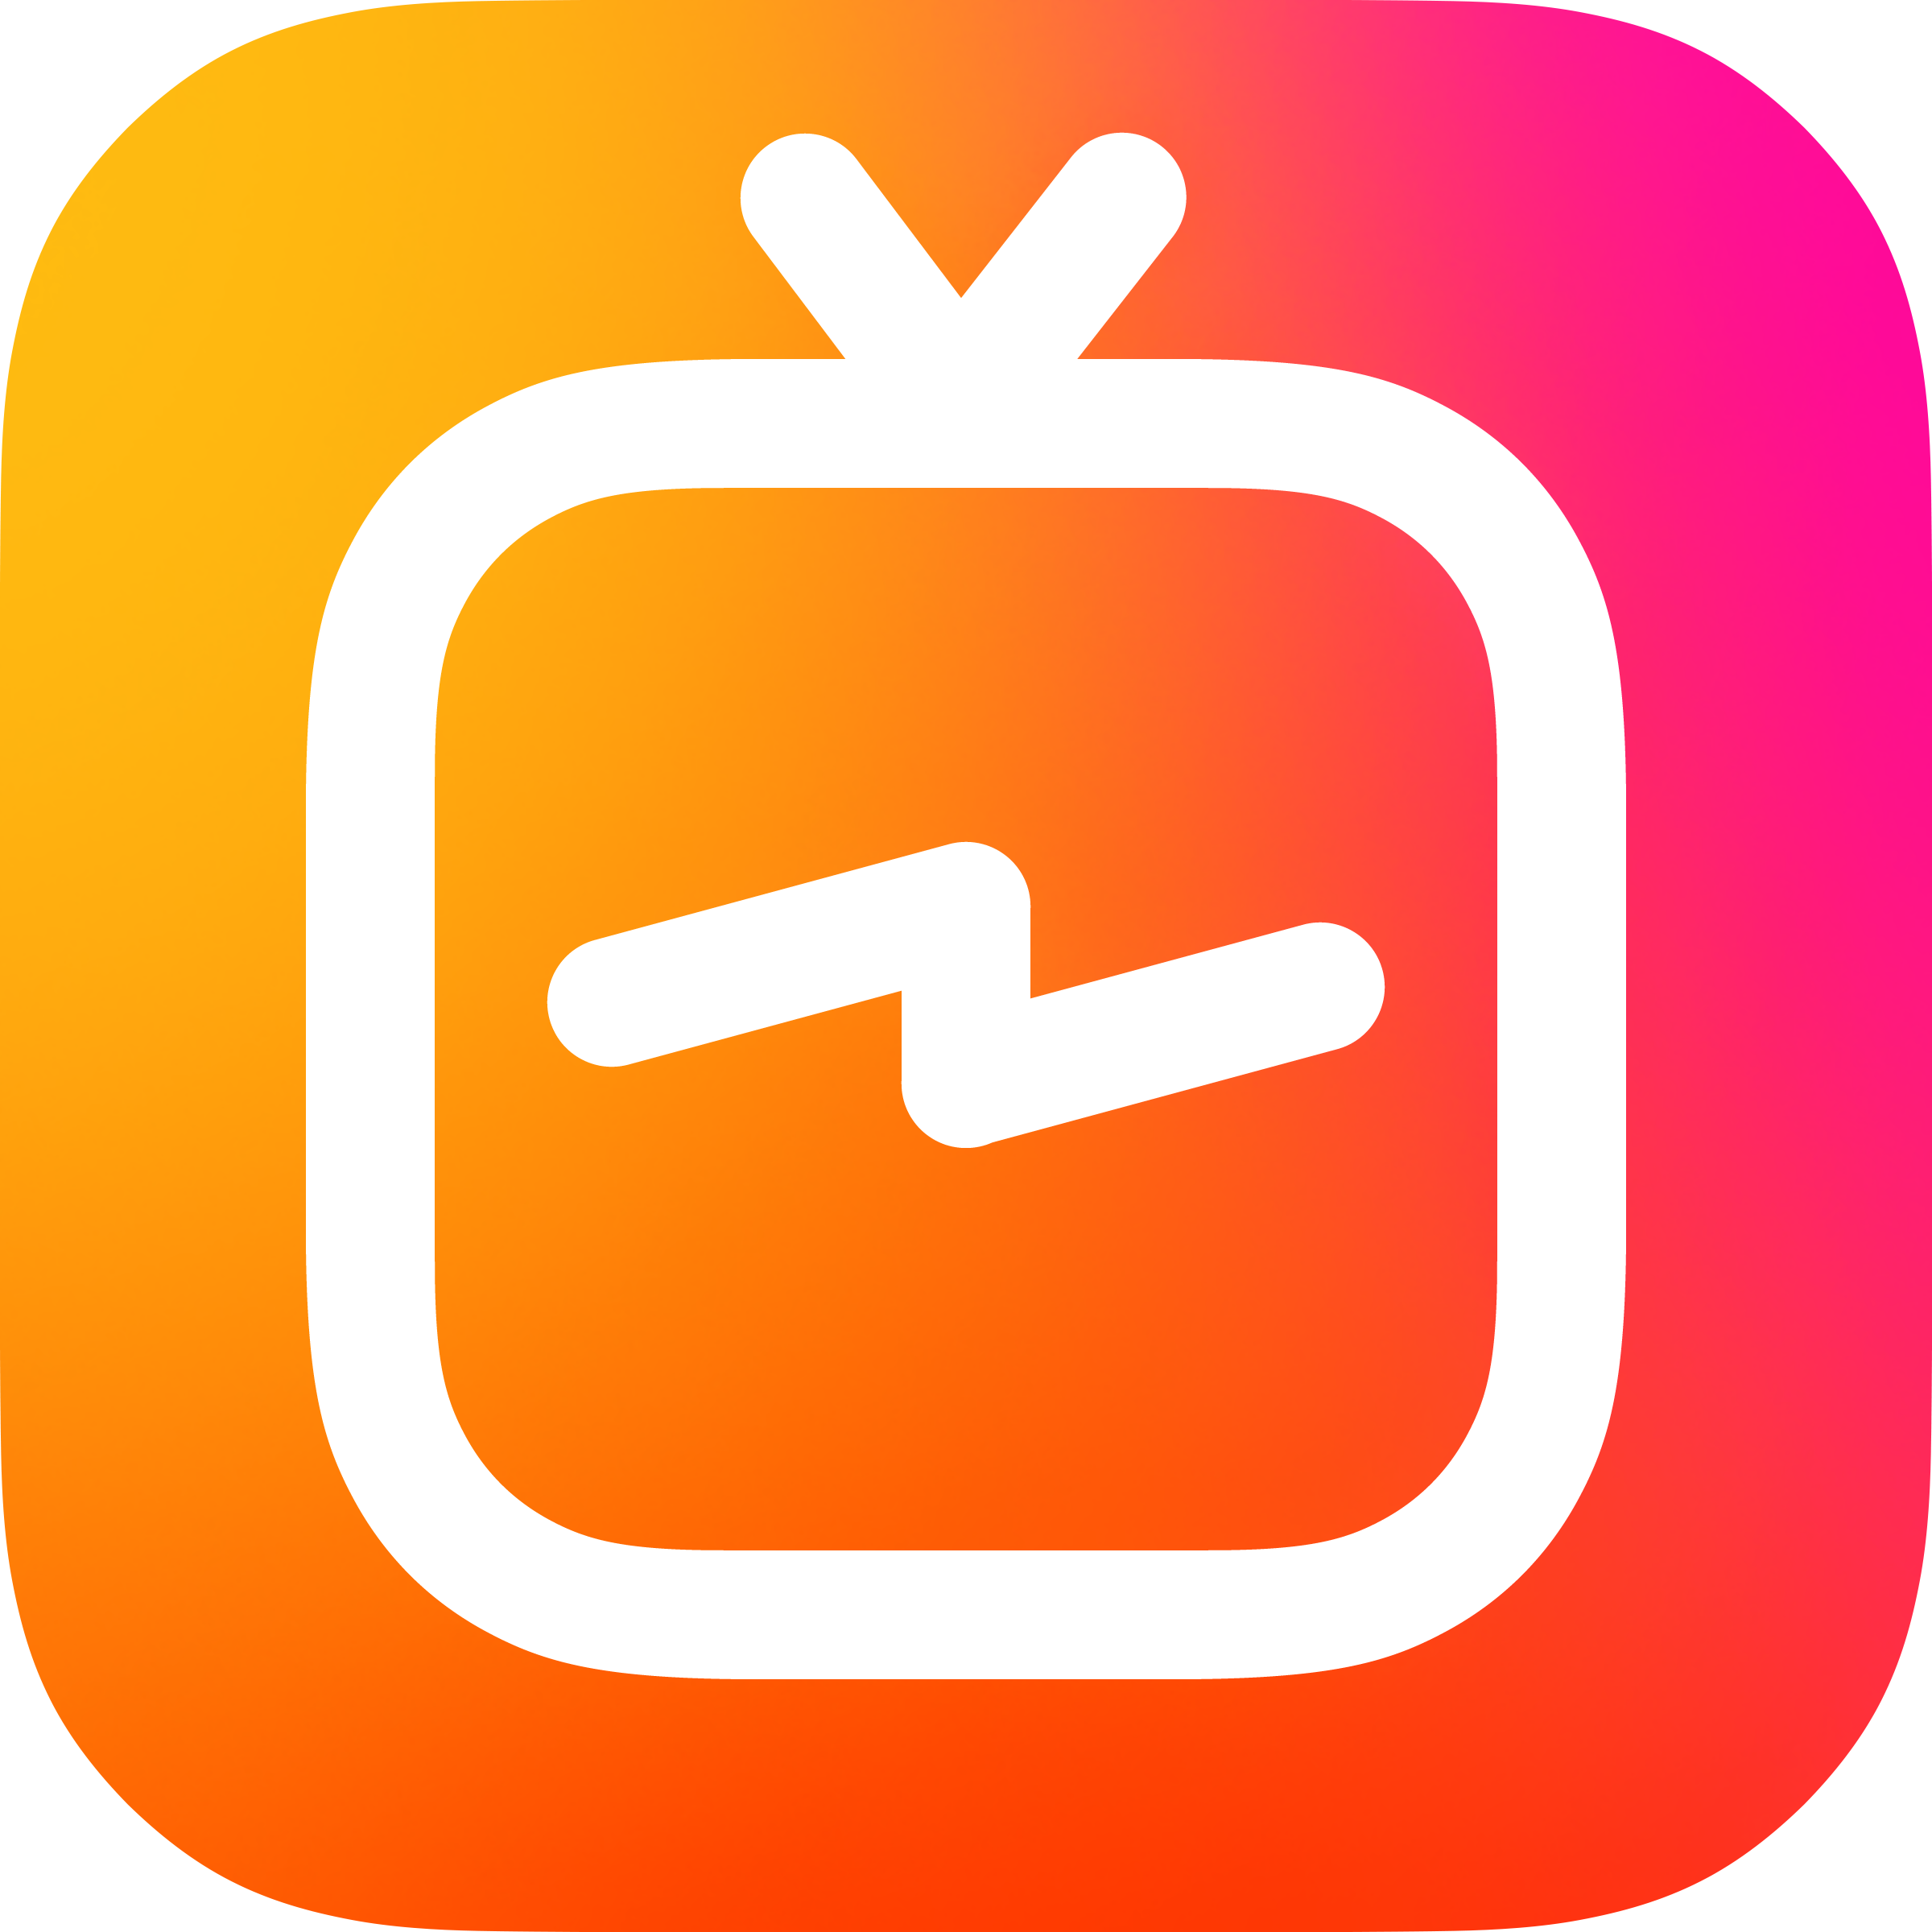 Logo Maker Apk For Pc